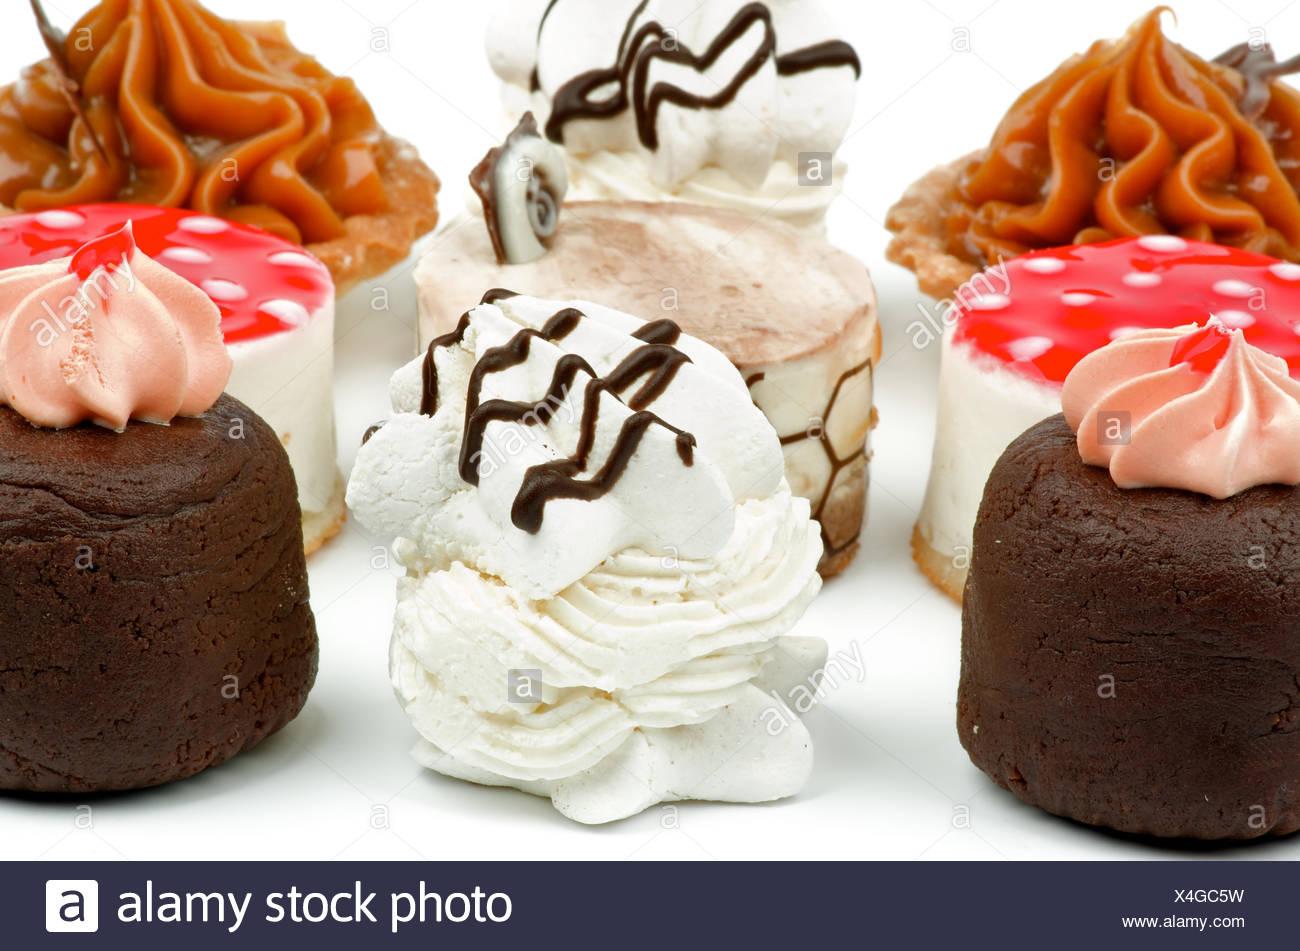 Arrangement of Cakes - Stock Image